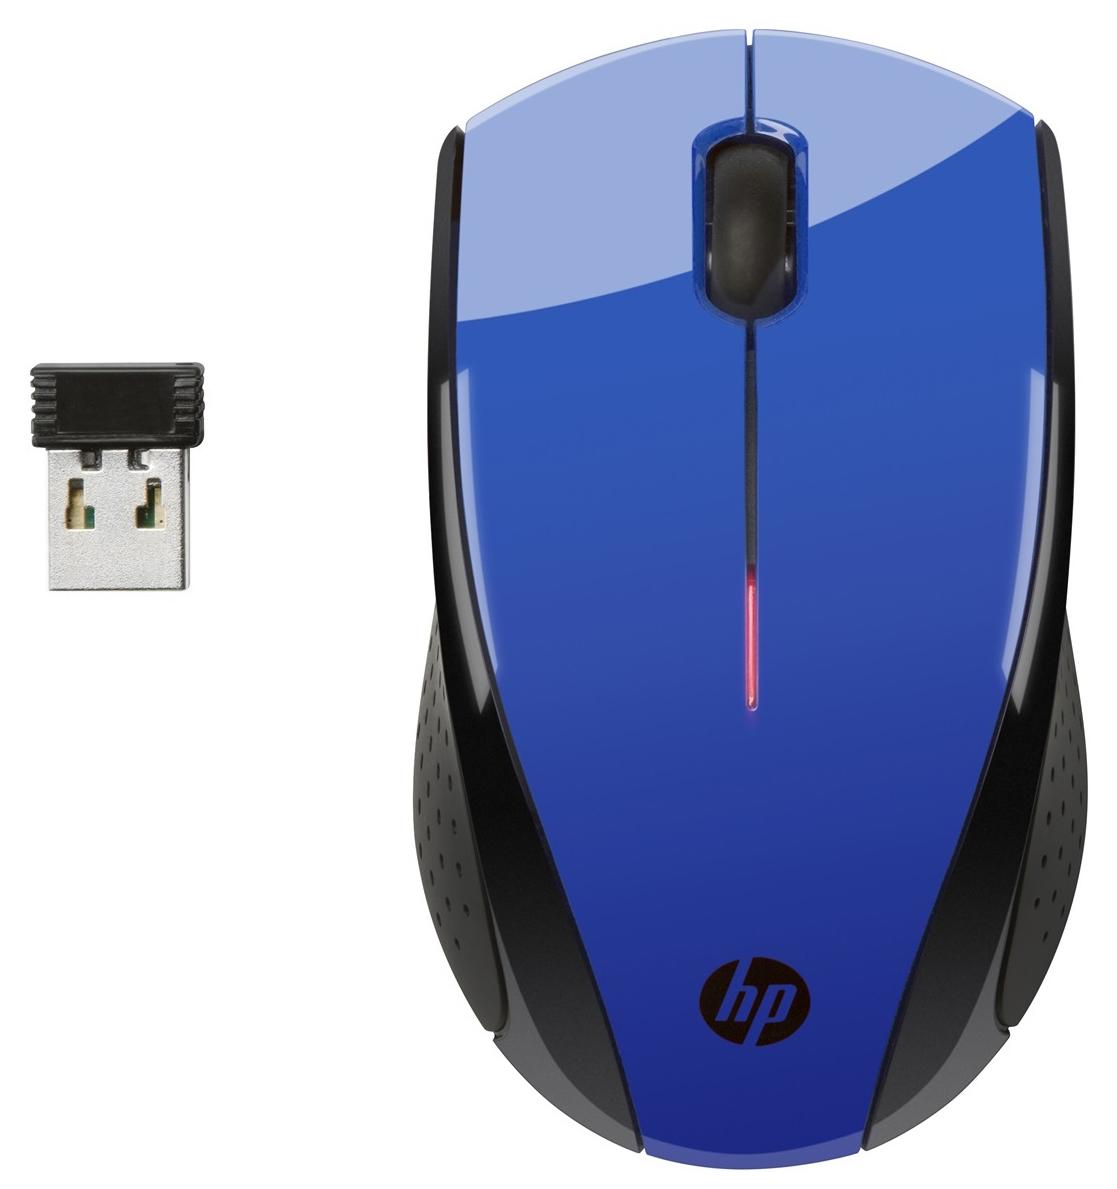 Wireless MouseБеспроводные мыши<br>Беспроводная мышь<br>